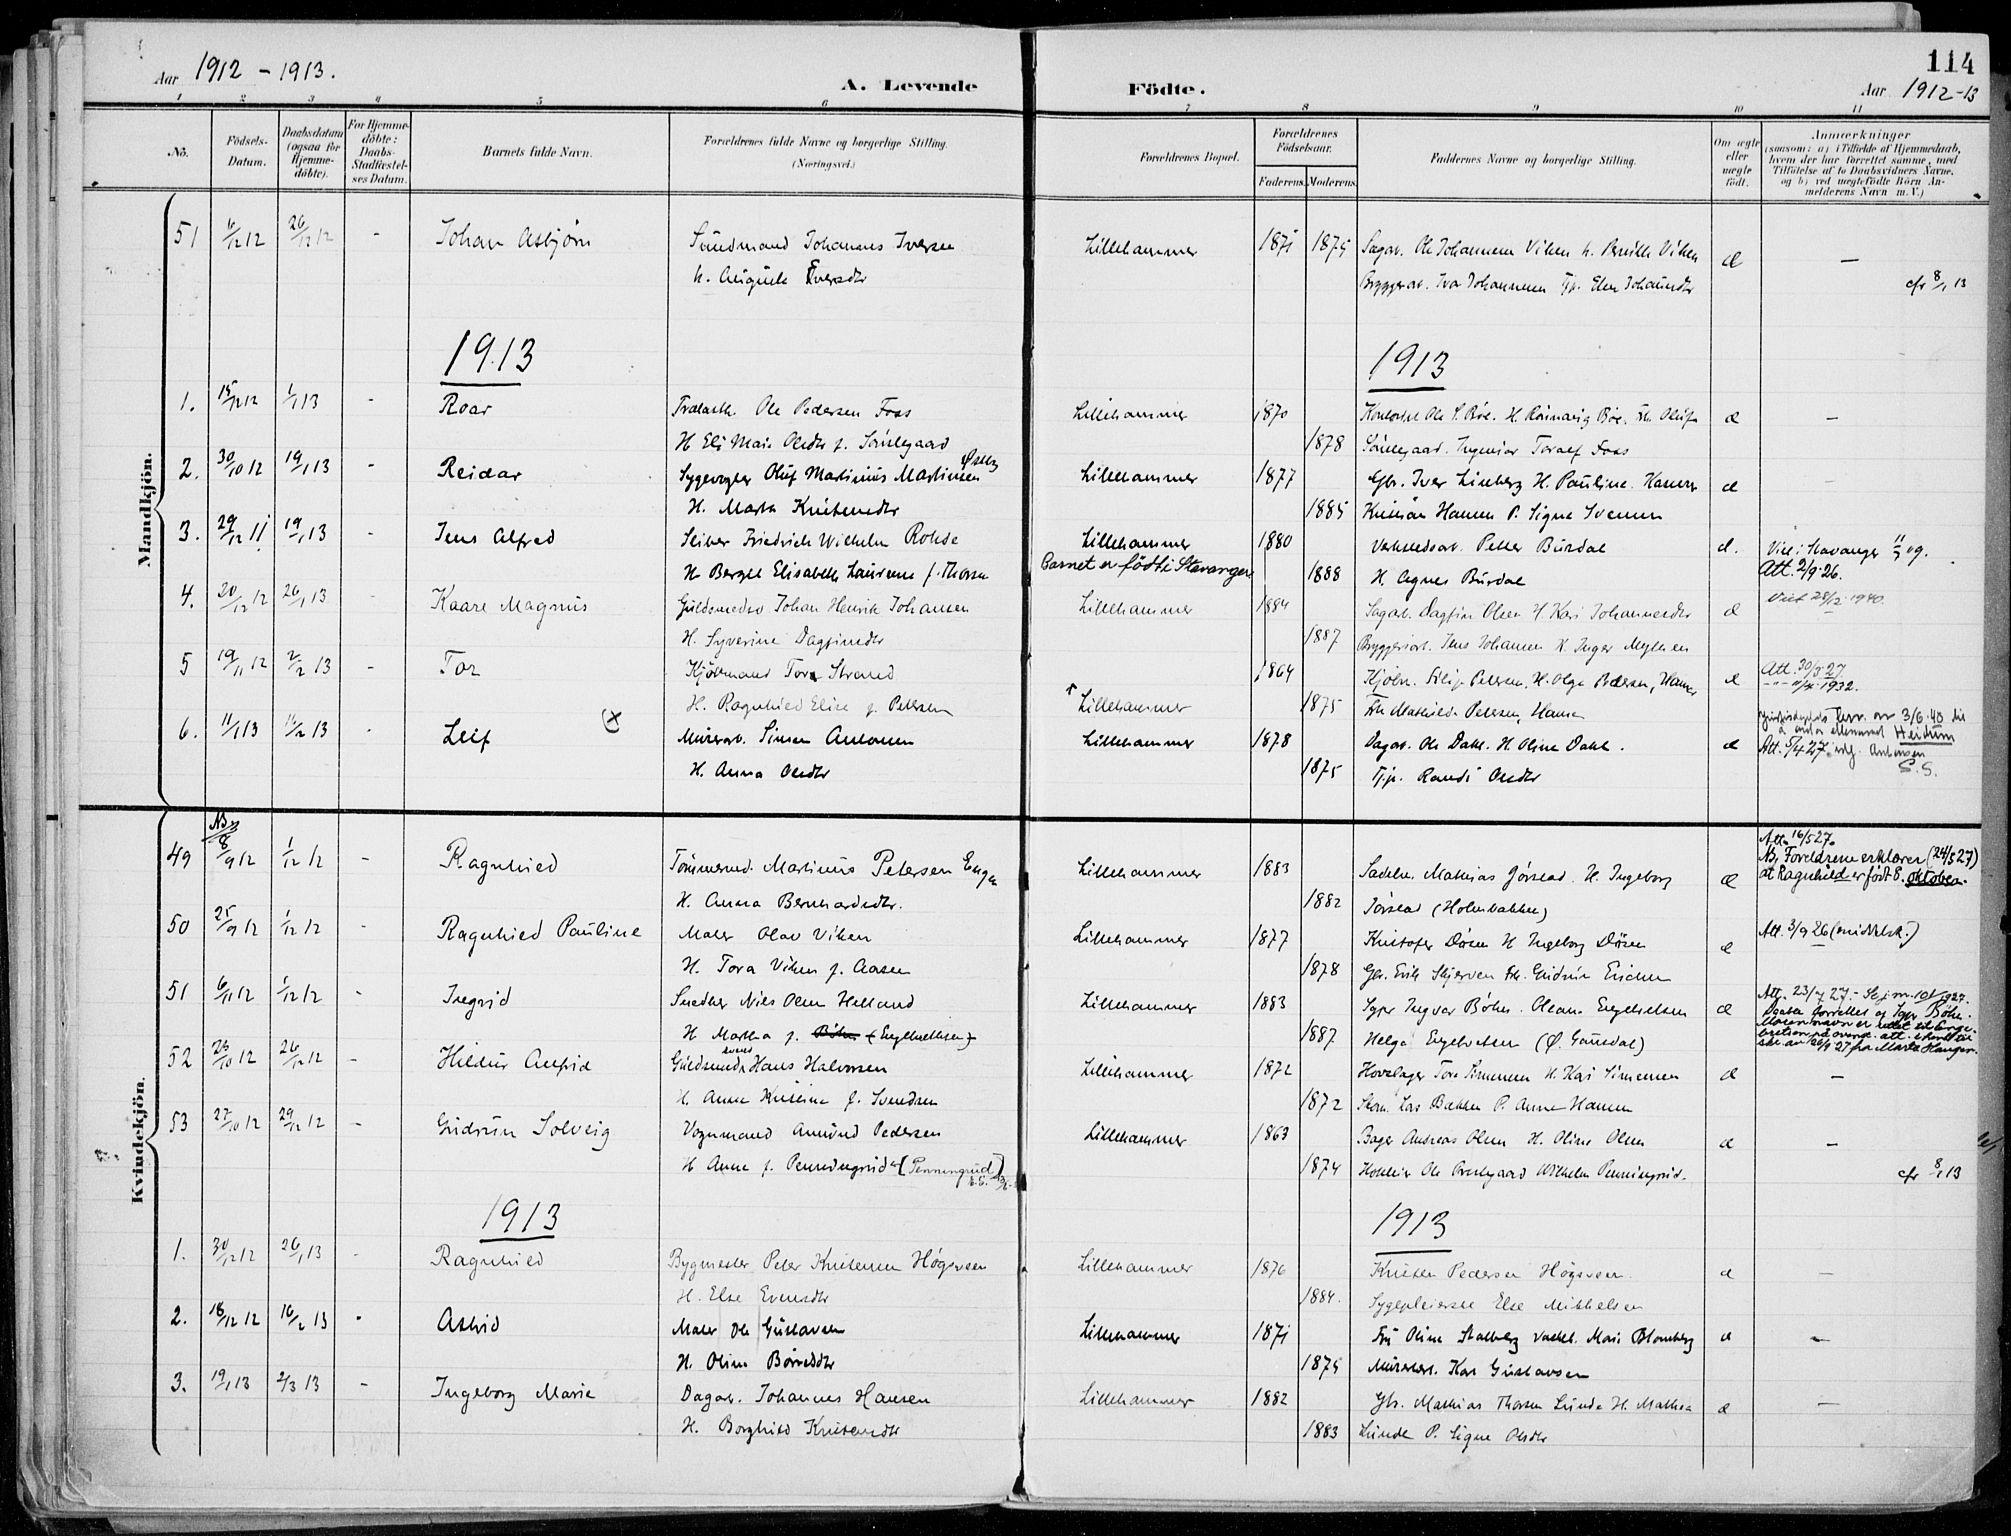 SAH, Lillehammer prestekontor, Ministerialbok nr. 1, 1901-1916, s. 114